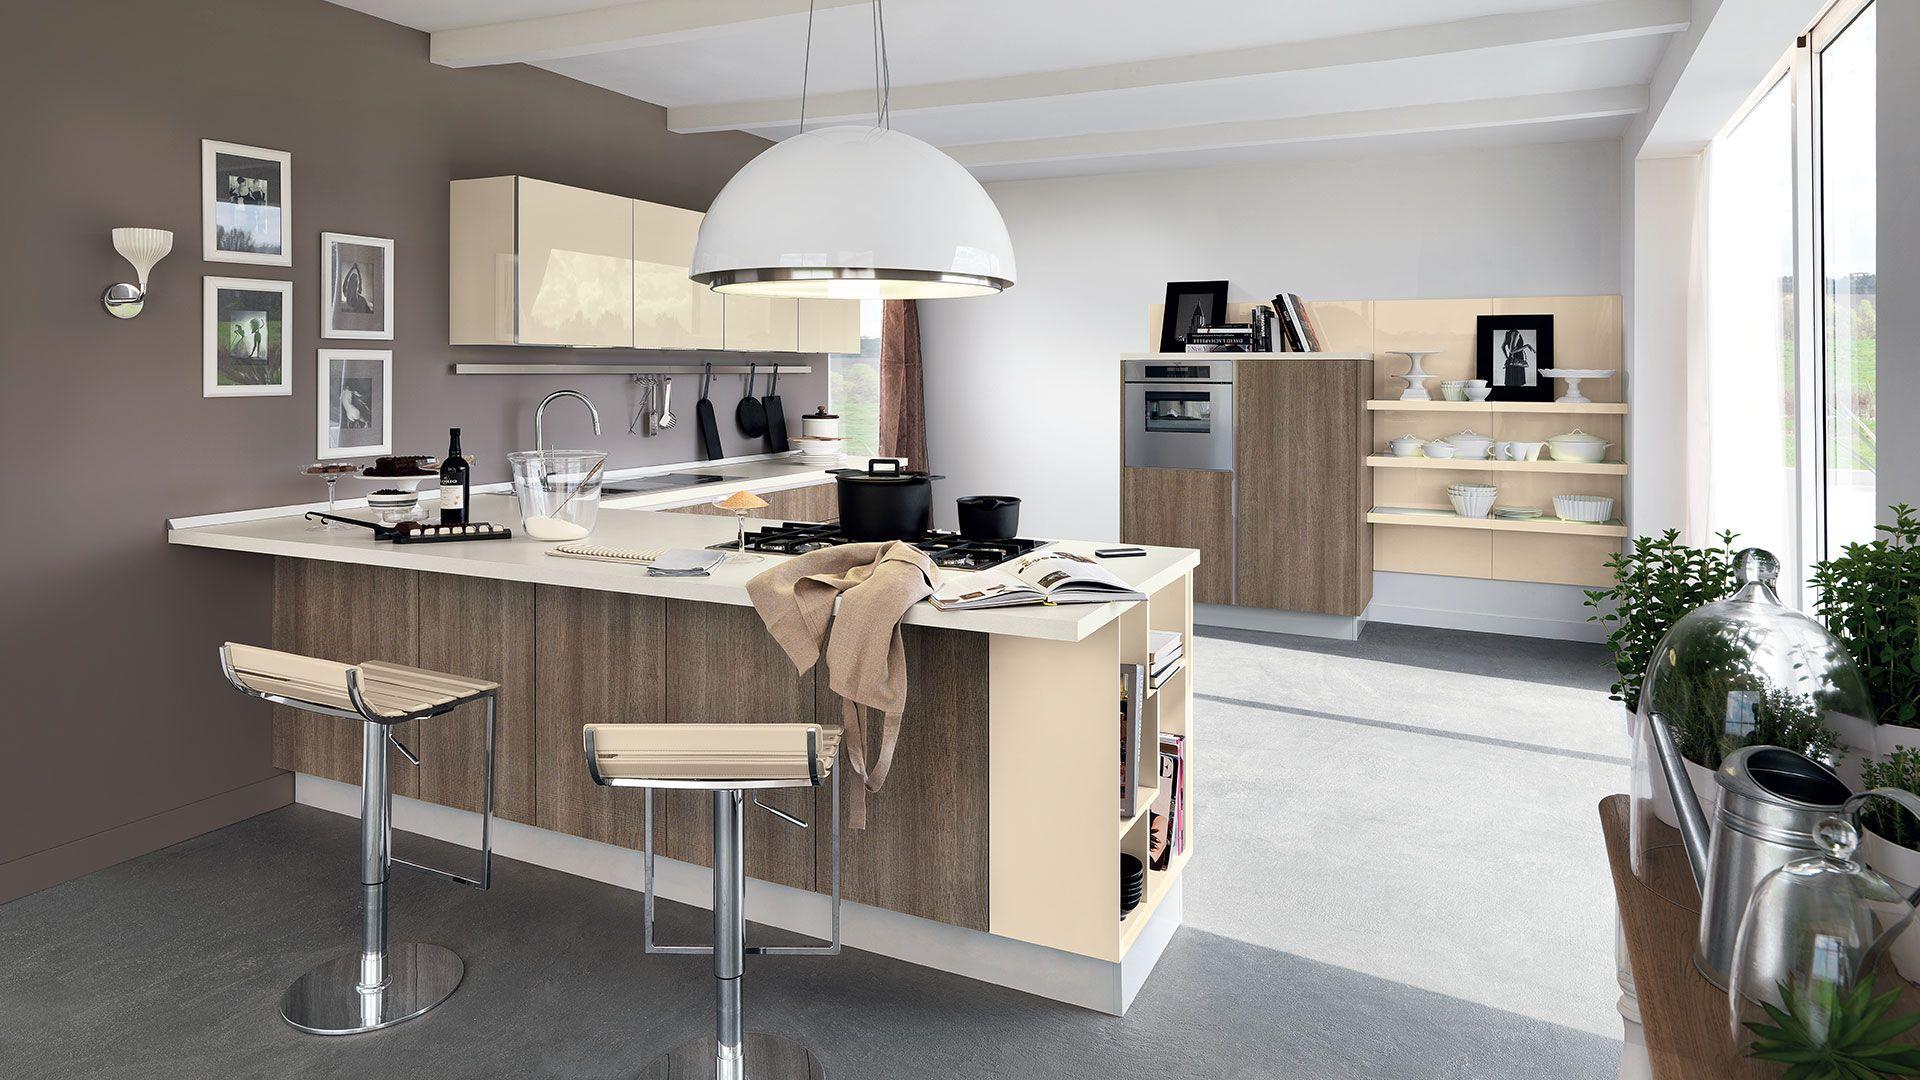 Essenza - Cucine Moderne - Cucine Lube | Cucine moderne ...